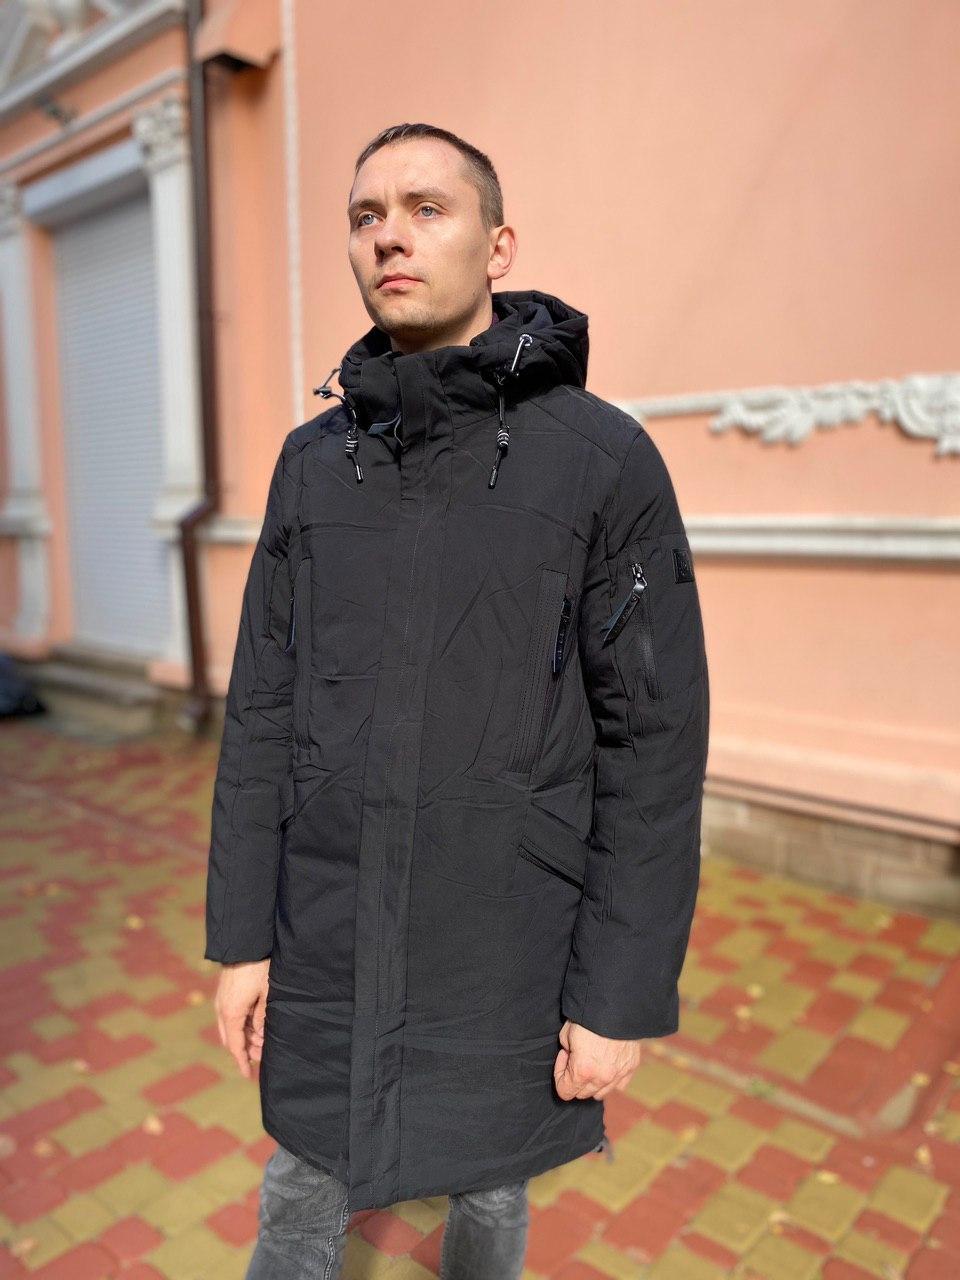 https://kurtochka.com/images/stories/virtuemart/product/photo_2020-10-09_12-26-32.jpg